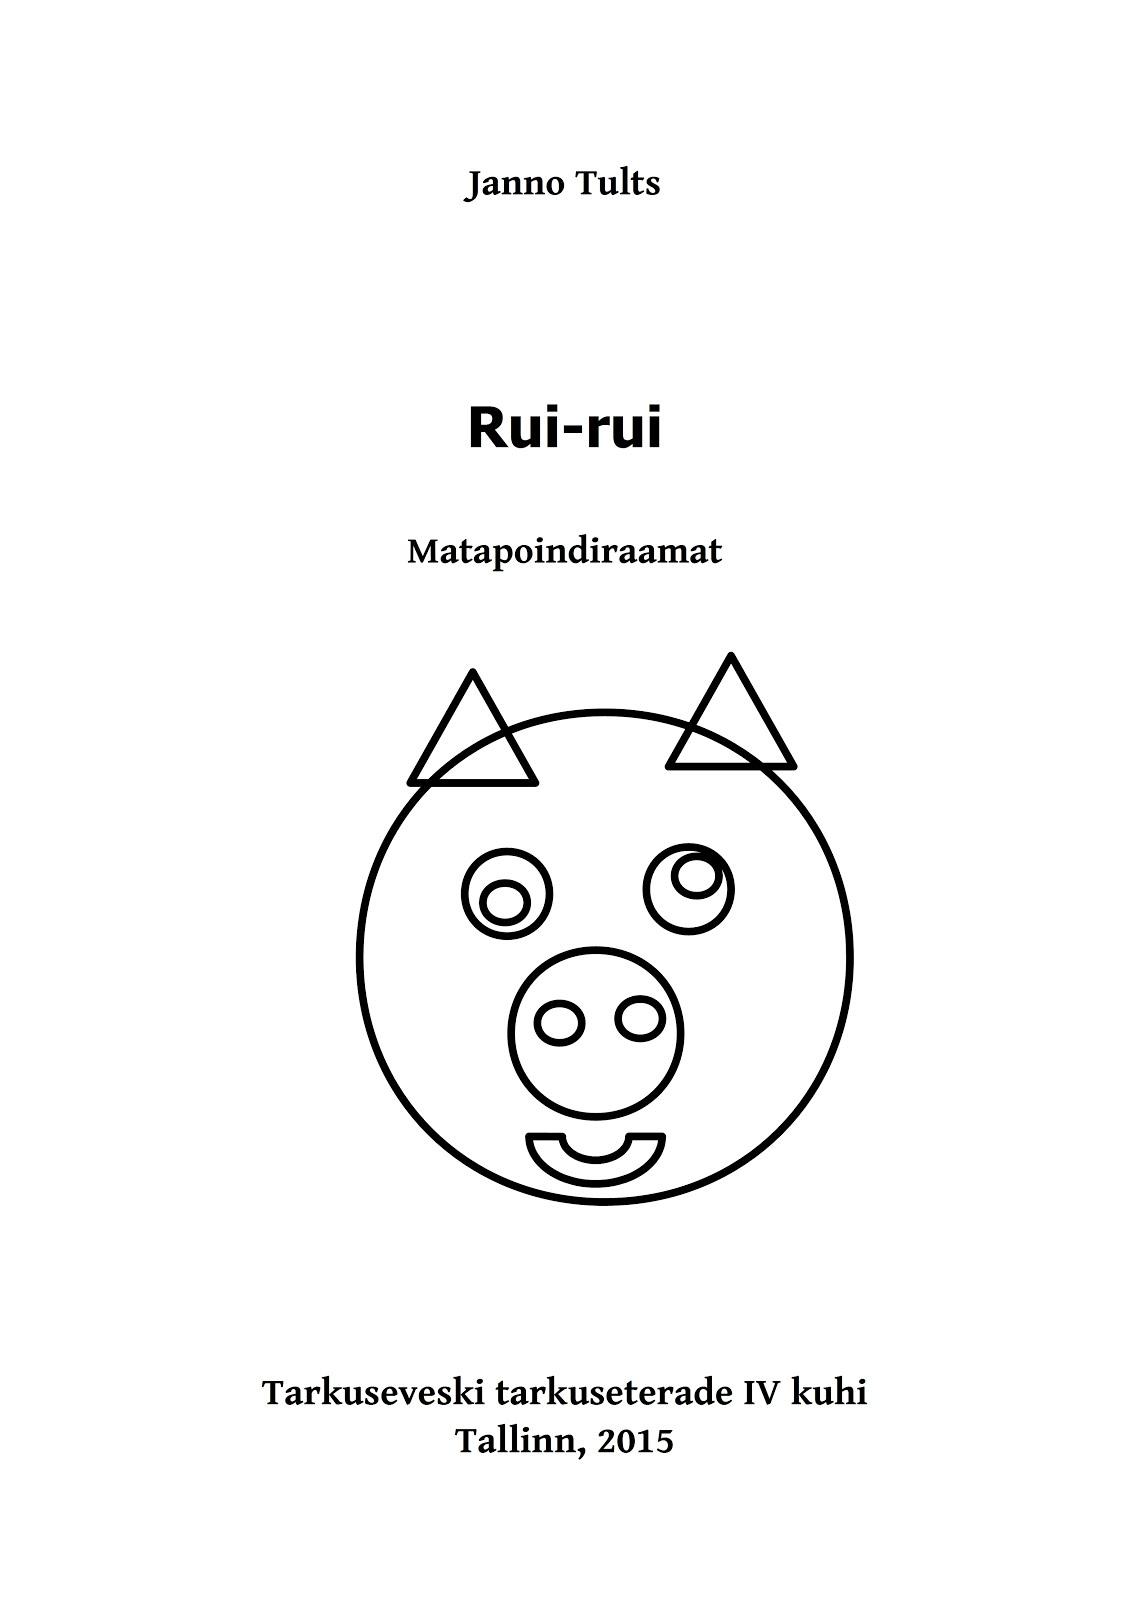 Rui-rui. matapoindiraamat